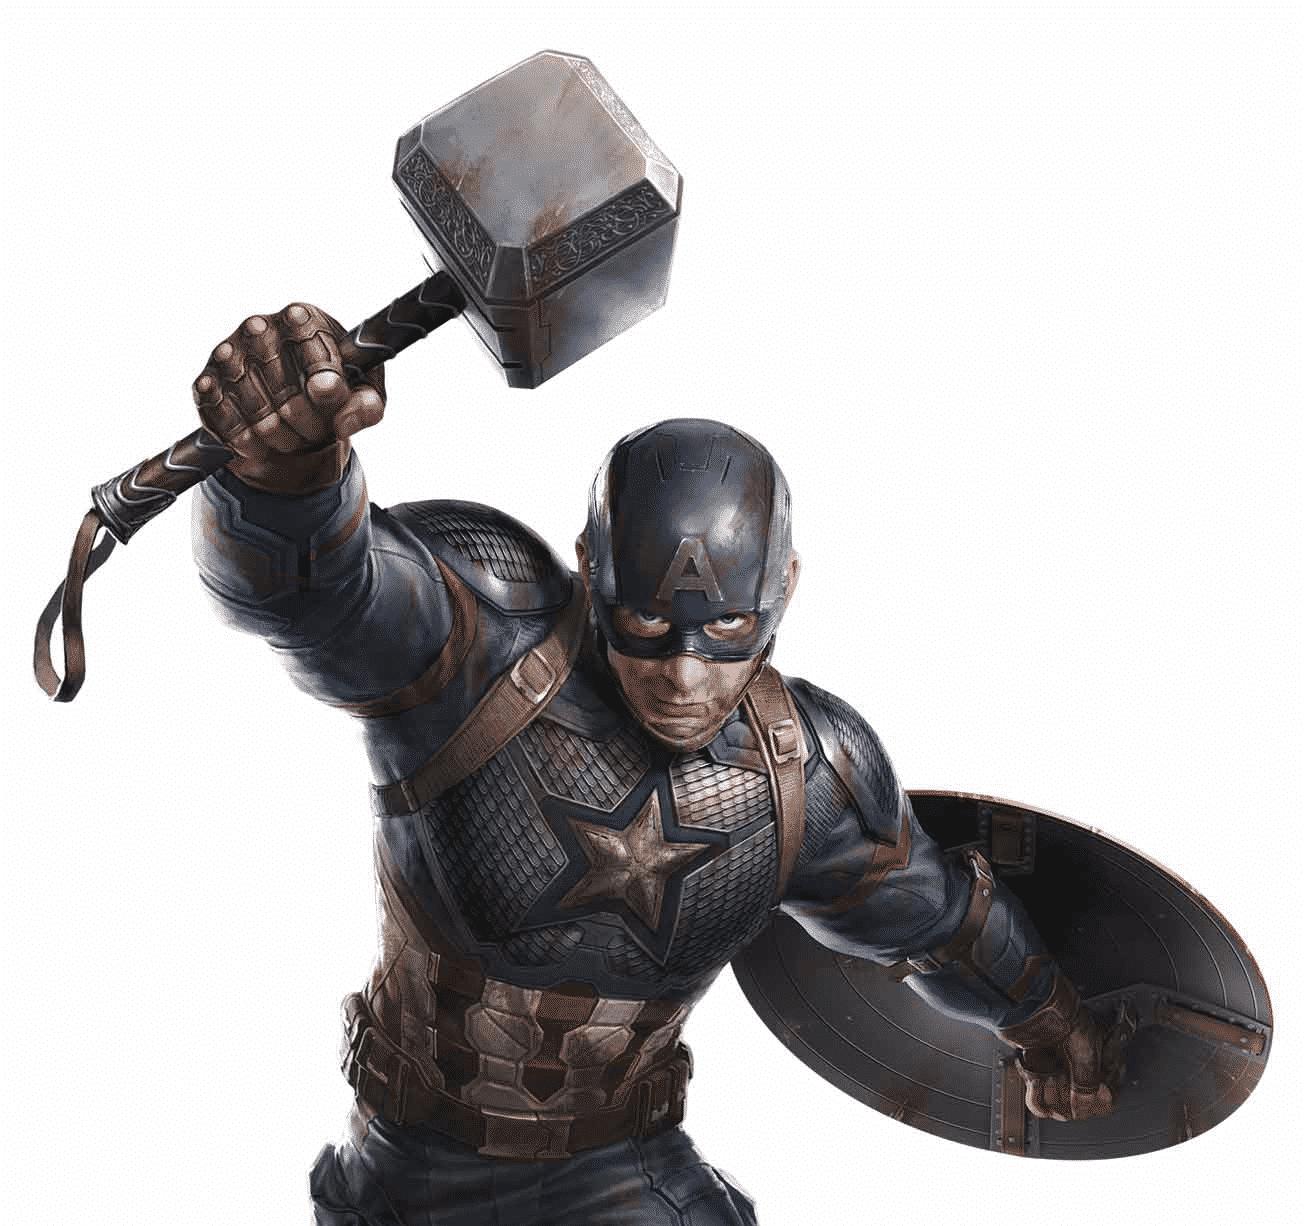 Captain America Mjolnir Cardboard Cutout & Avengers ...